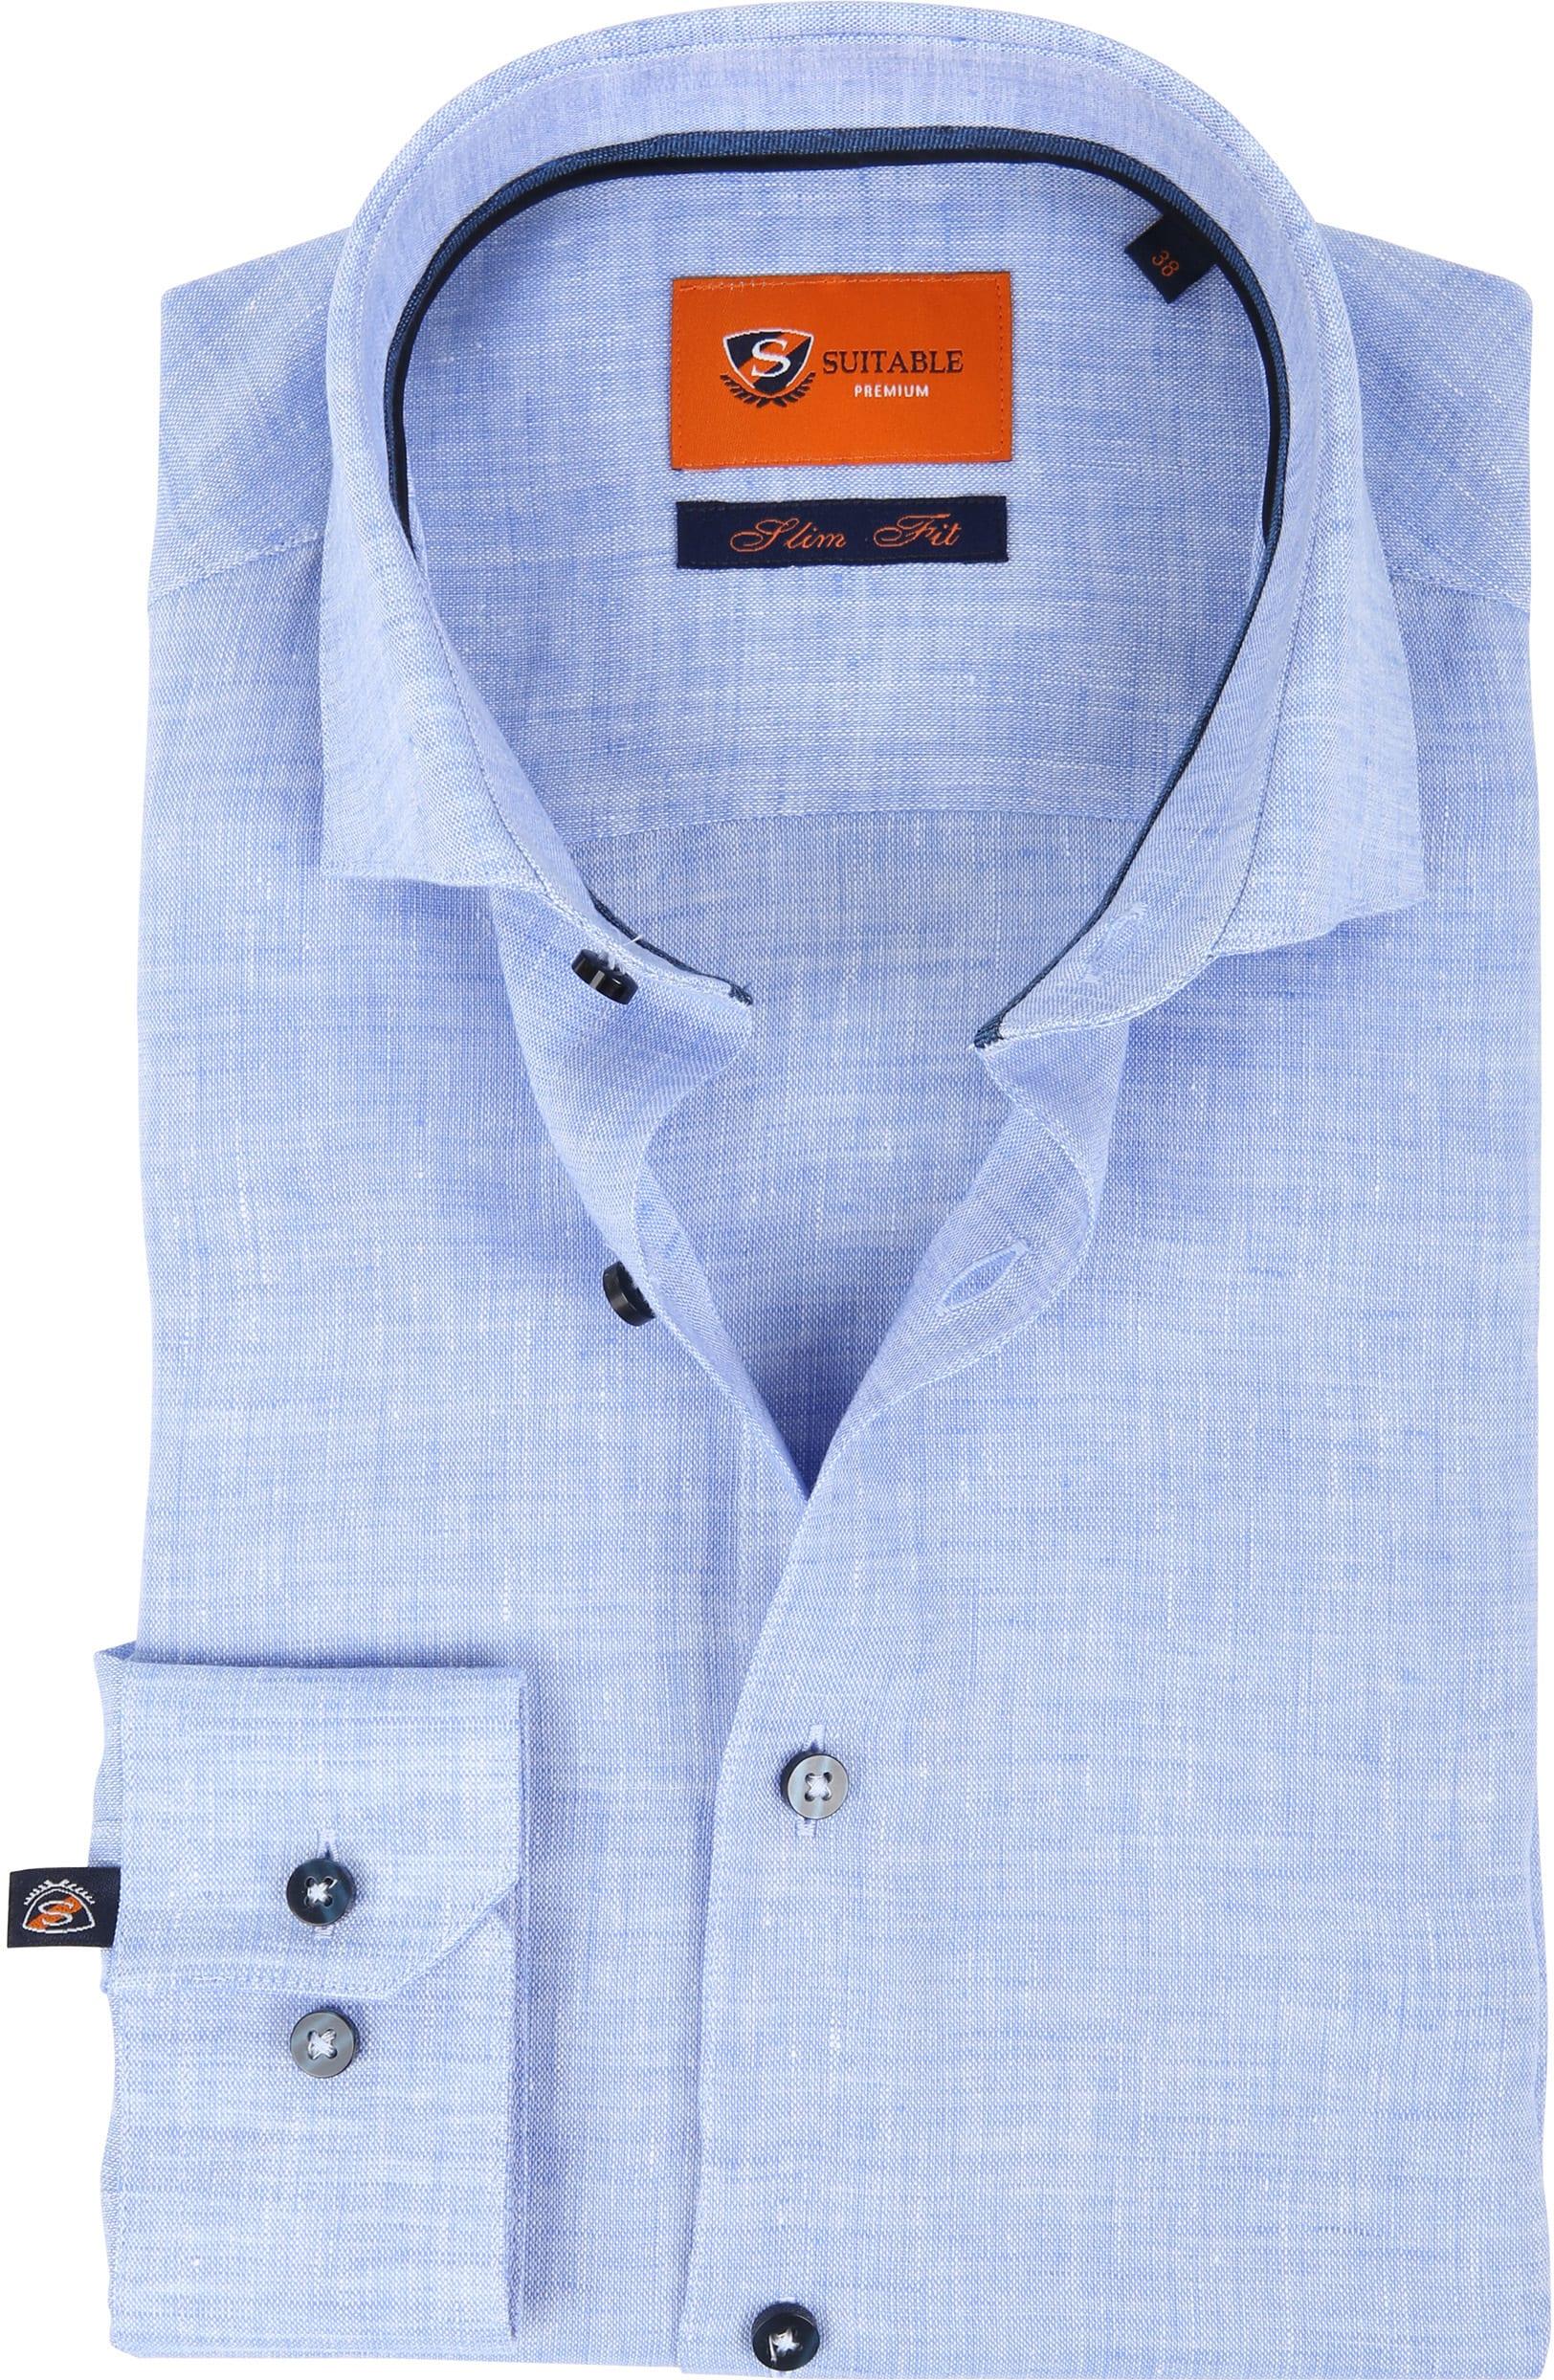 Suitable Hemd Leinen Blau D81-12